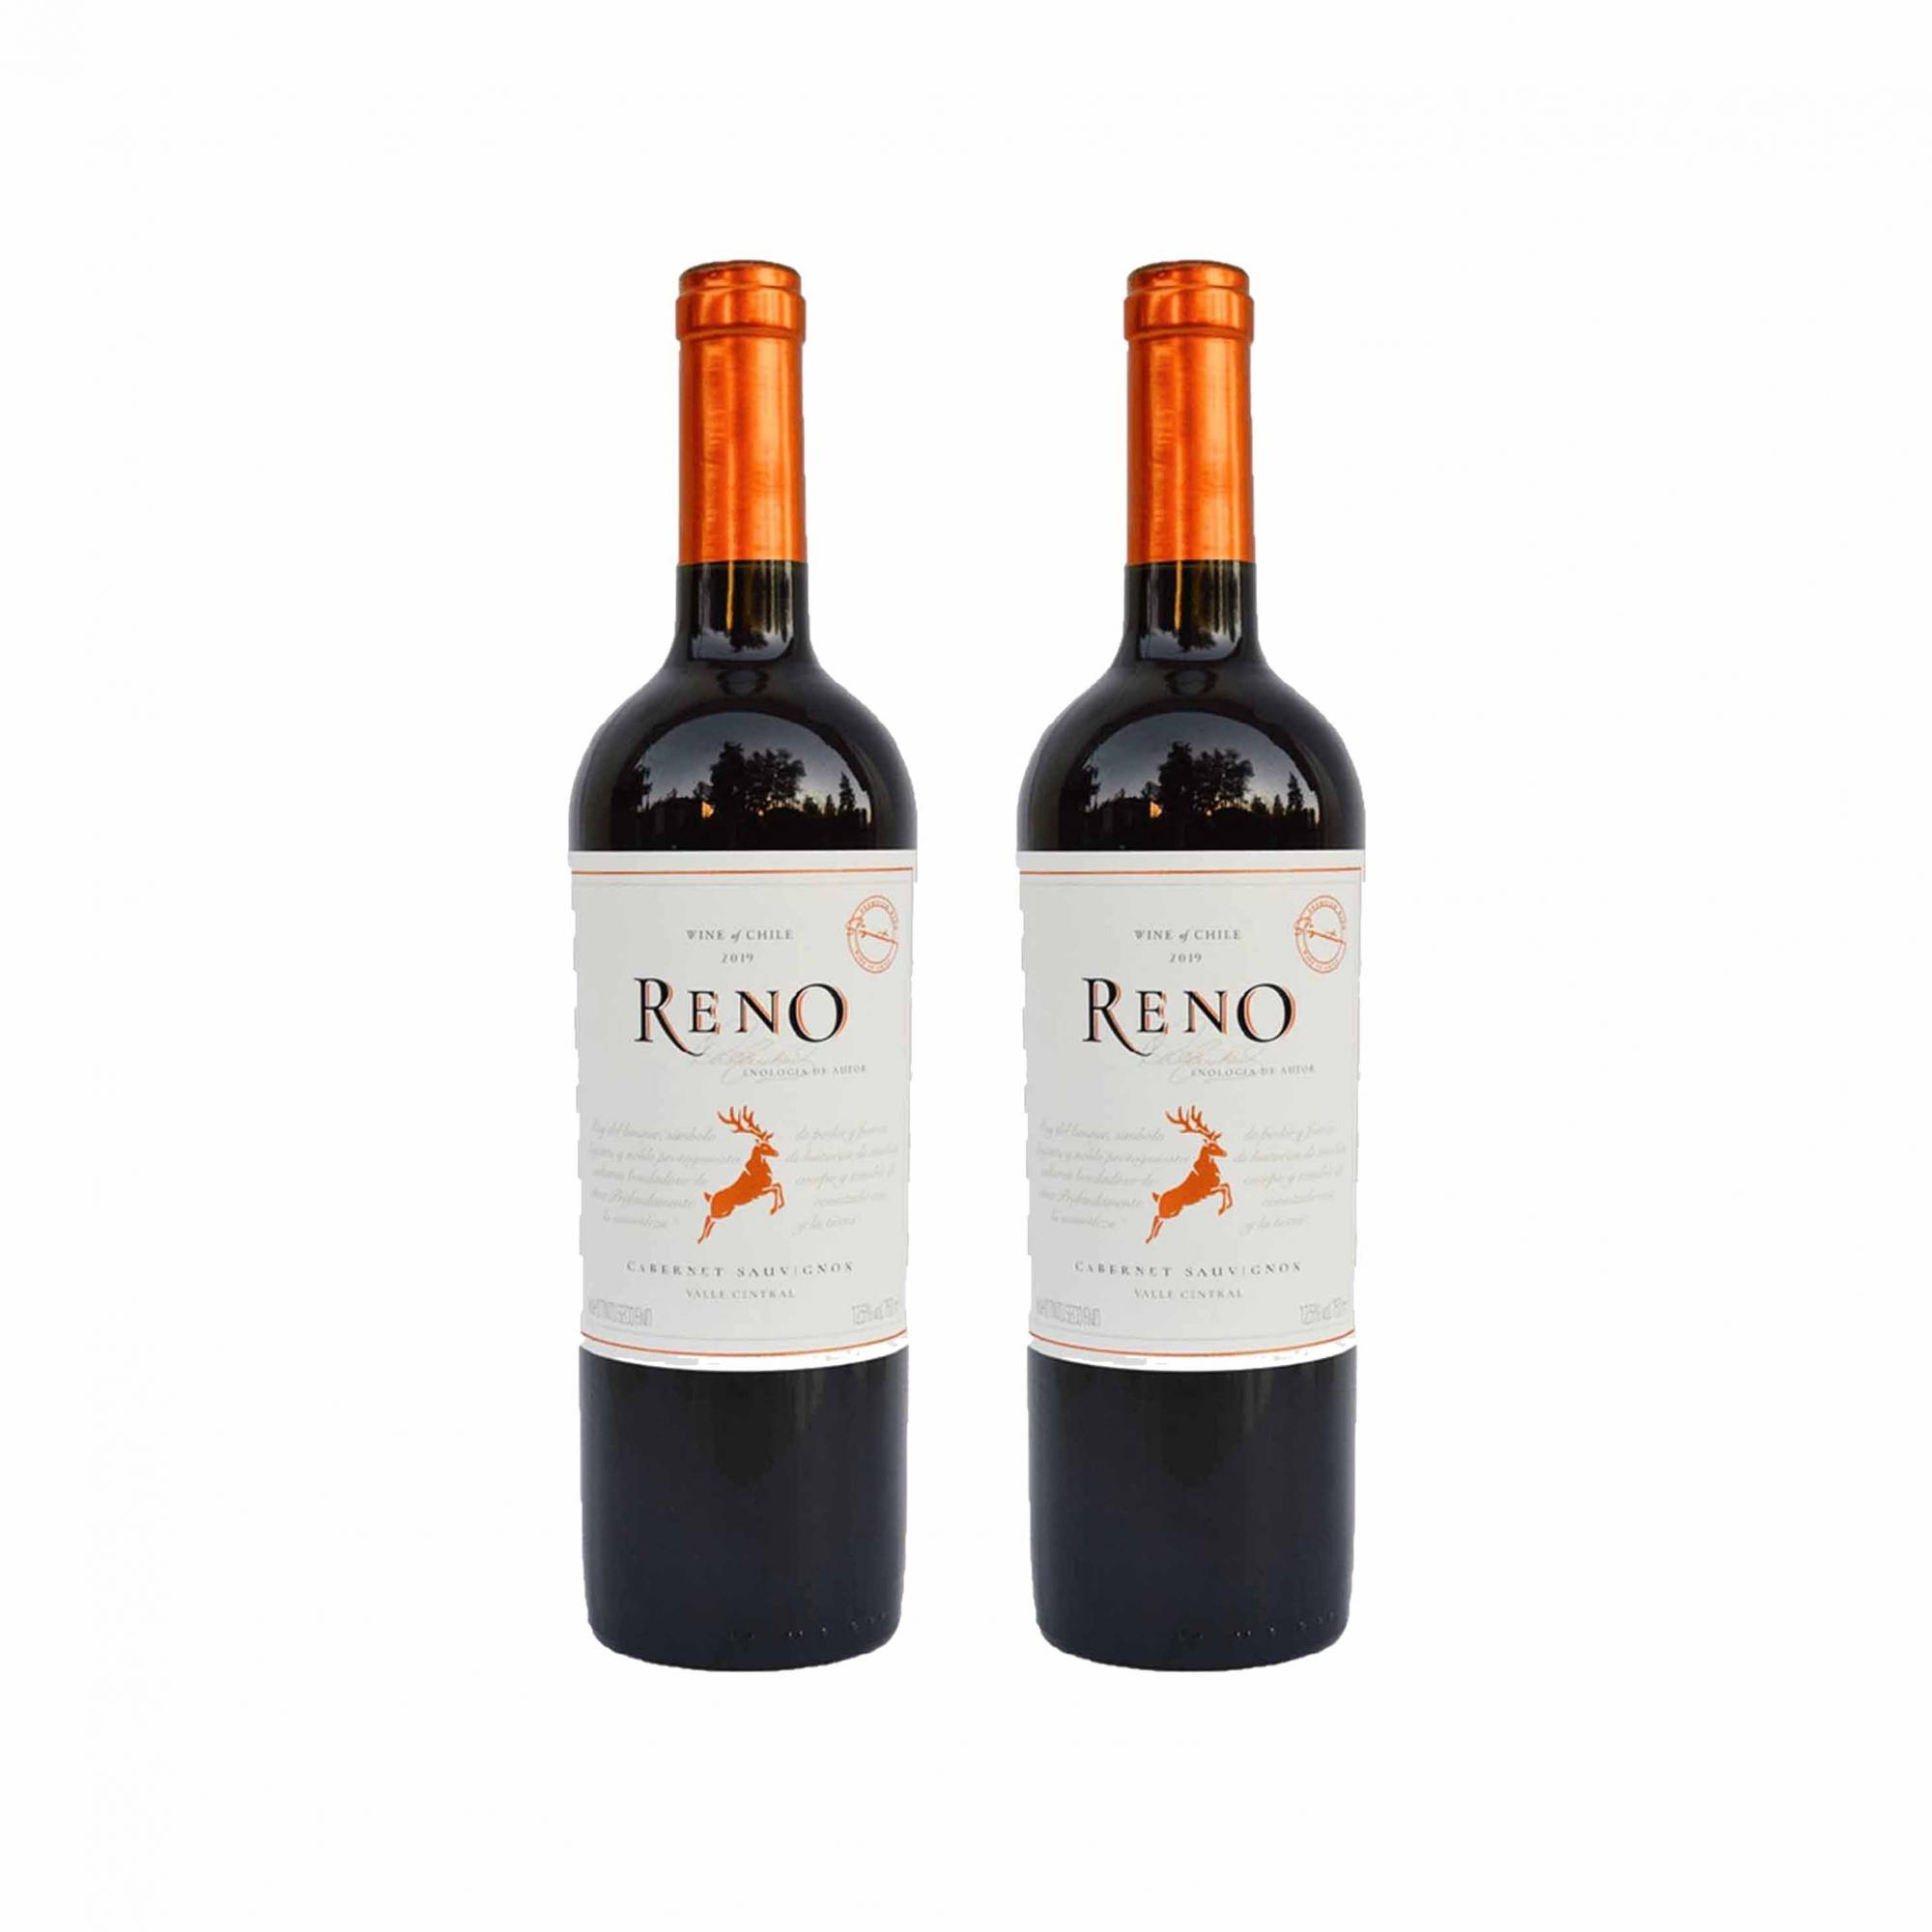 Kit 2x Vinho Tinto Chileno Reno Cabernet Sauvignon 2019